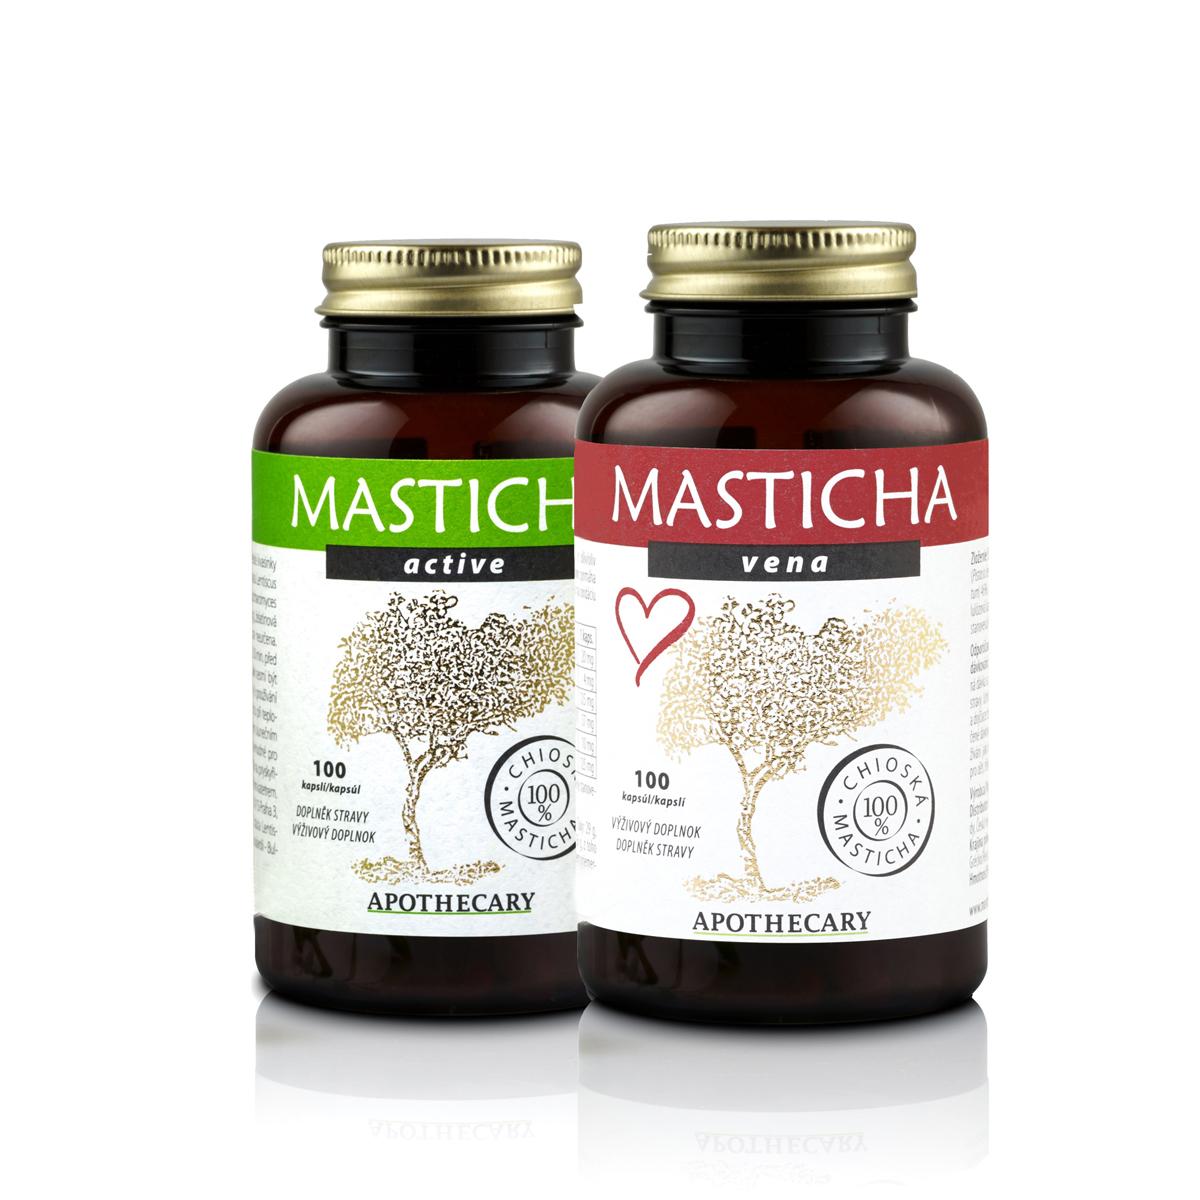 Masticha Terapia Set masticha Active + masticha Vena - prírodné kôra na podporu zdravia